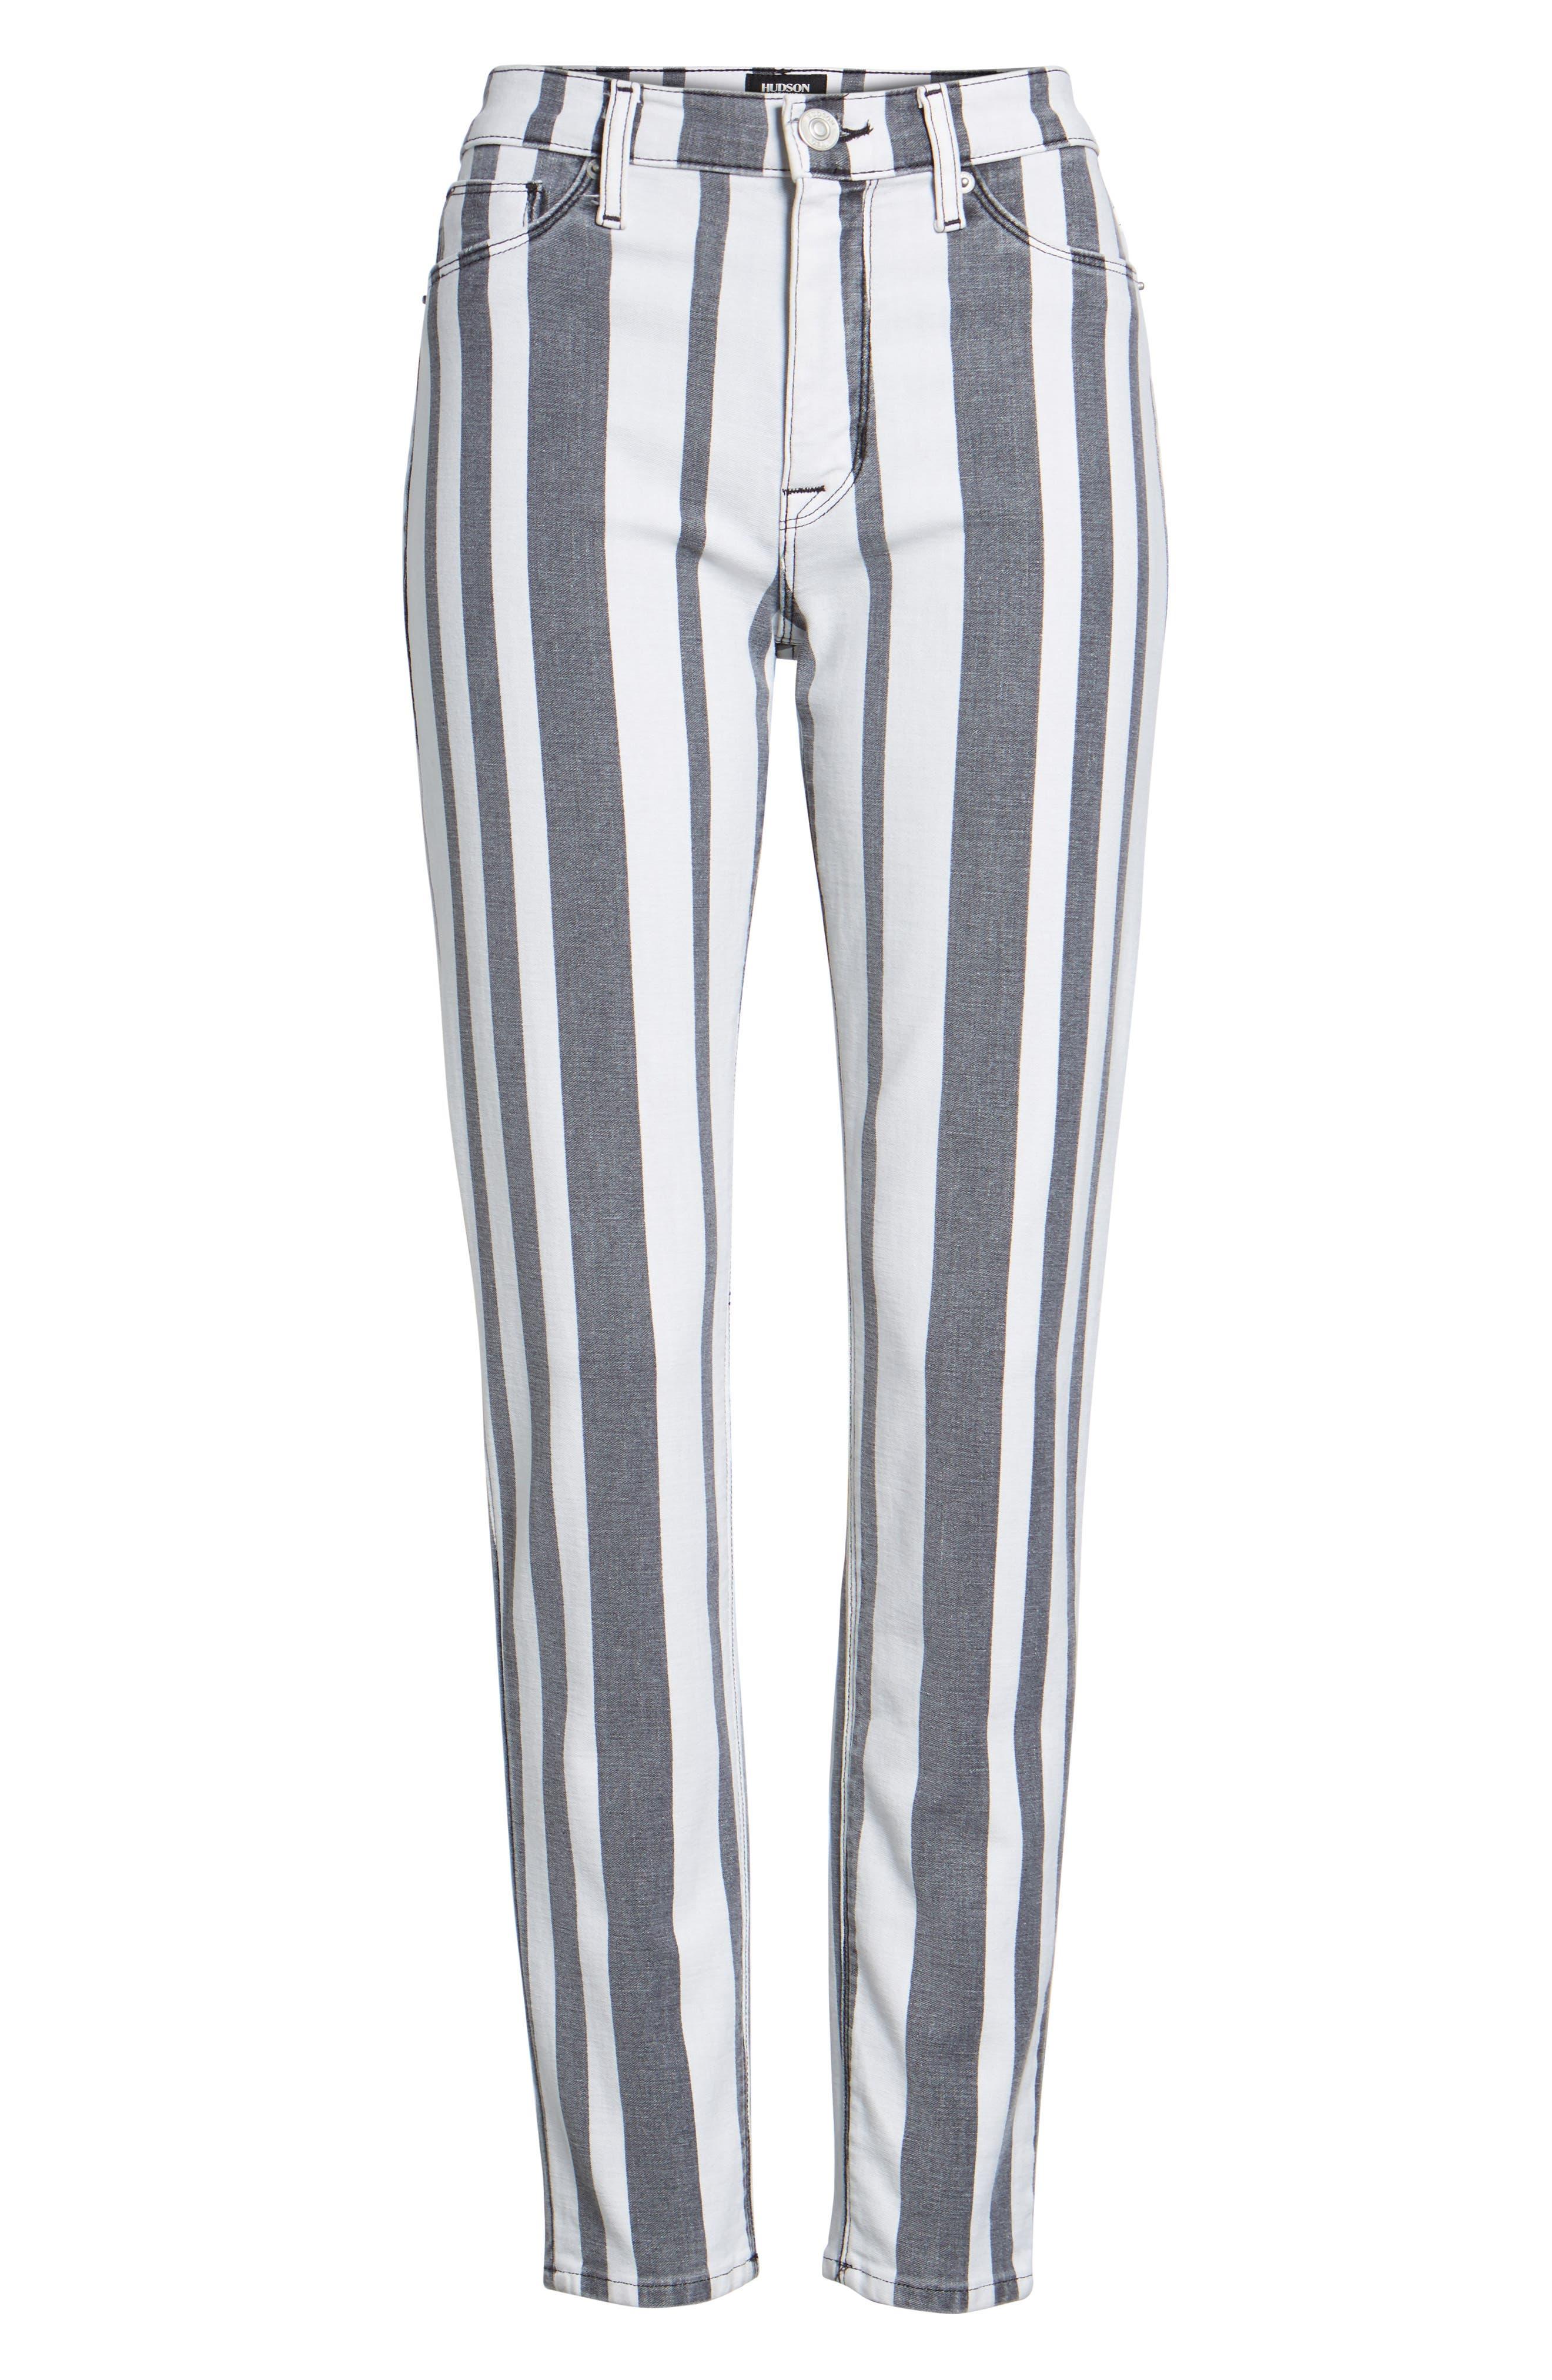 Barbara High Waist Ankle Super Skinny Jeans,                             Alternate thumbnail 6, color,                             461